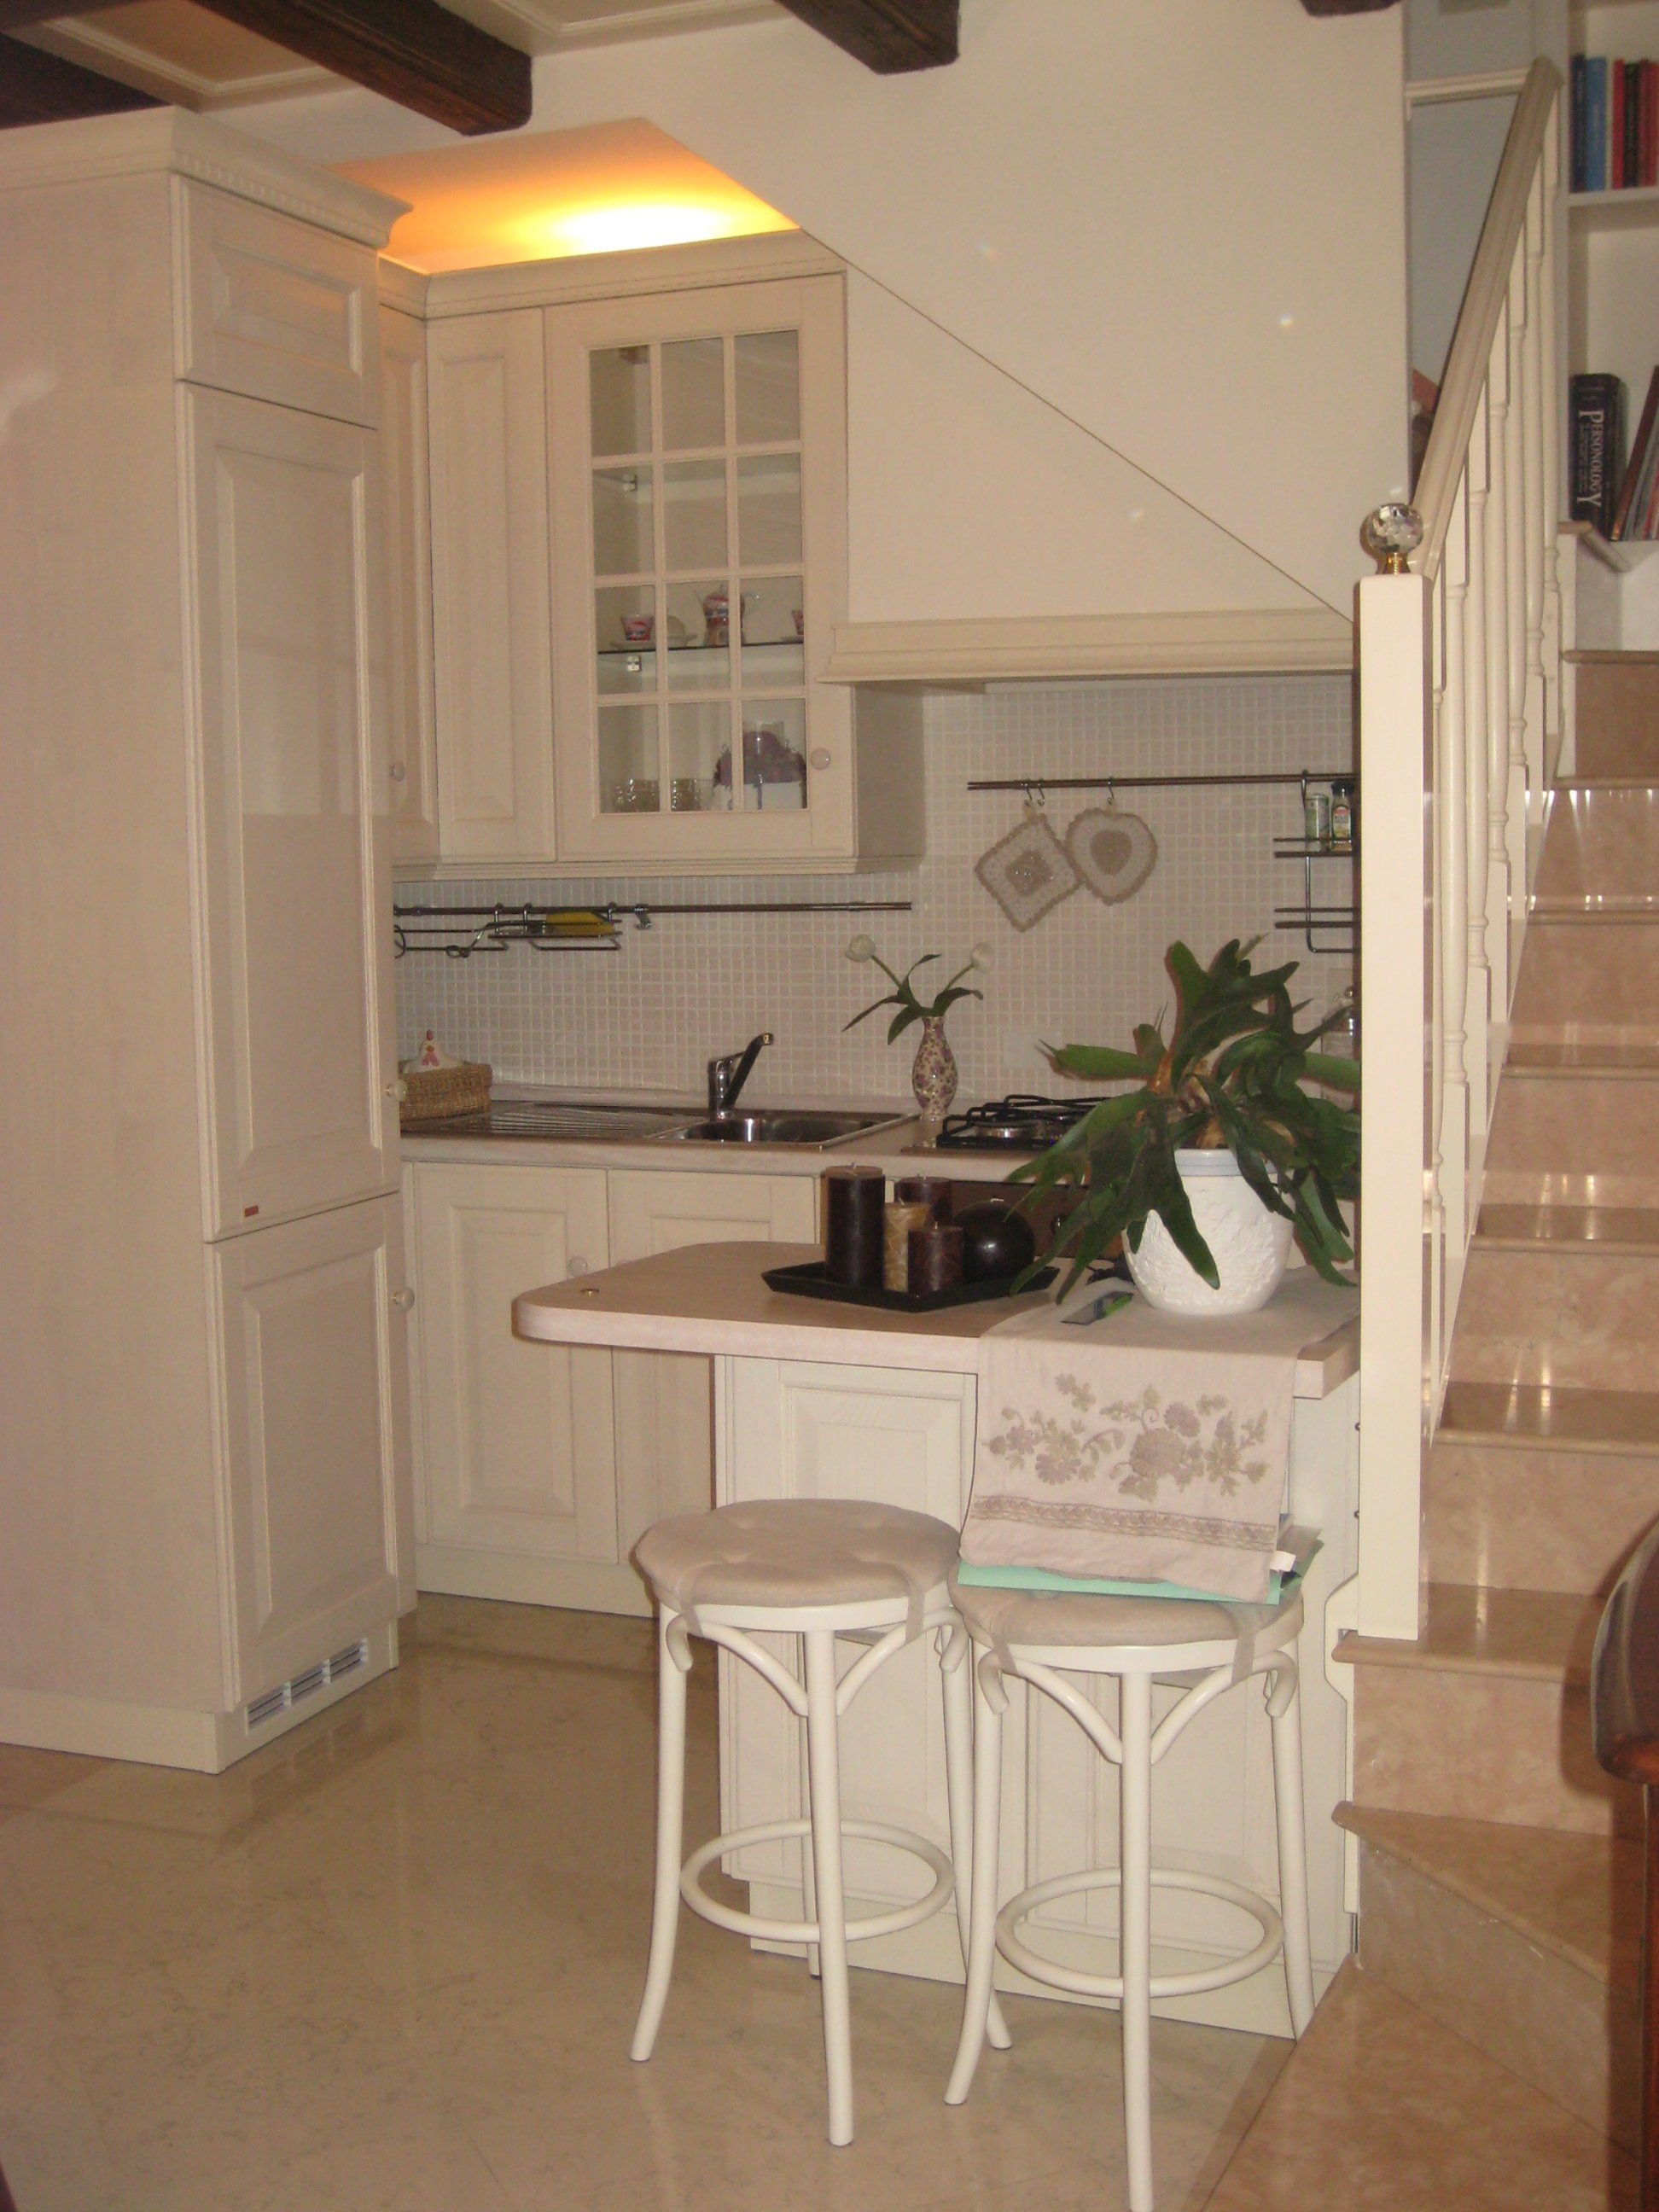 Cucina bianca sottoscala chic scavolini classica baltimora me my classic homes - Scavolini cucina bianca ...